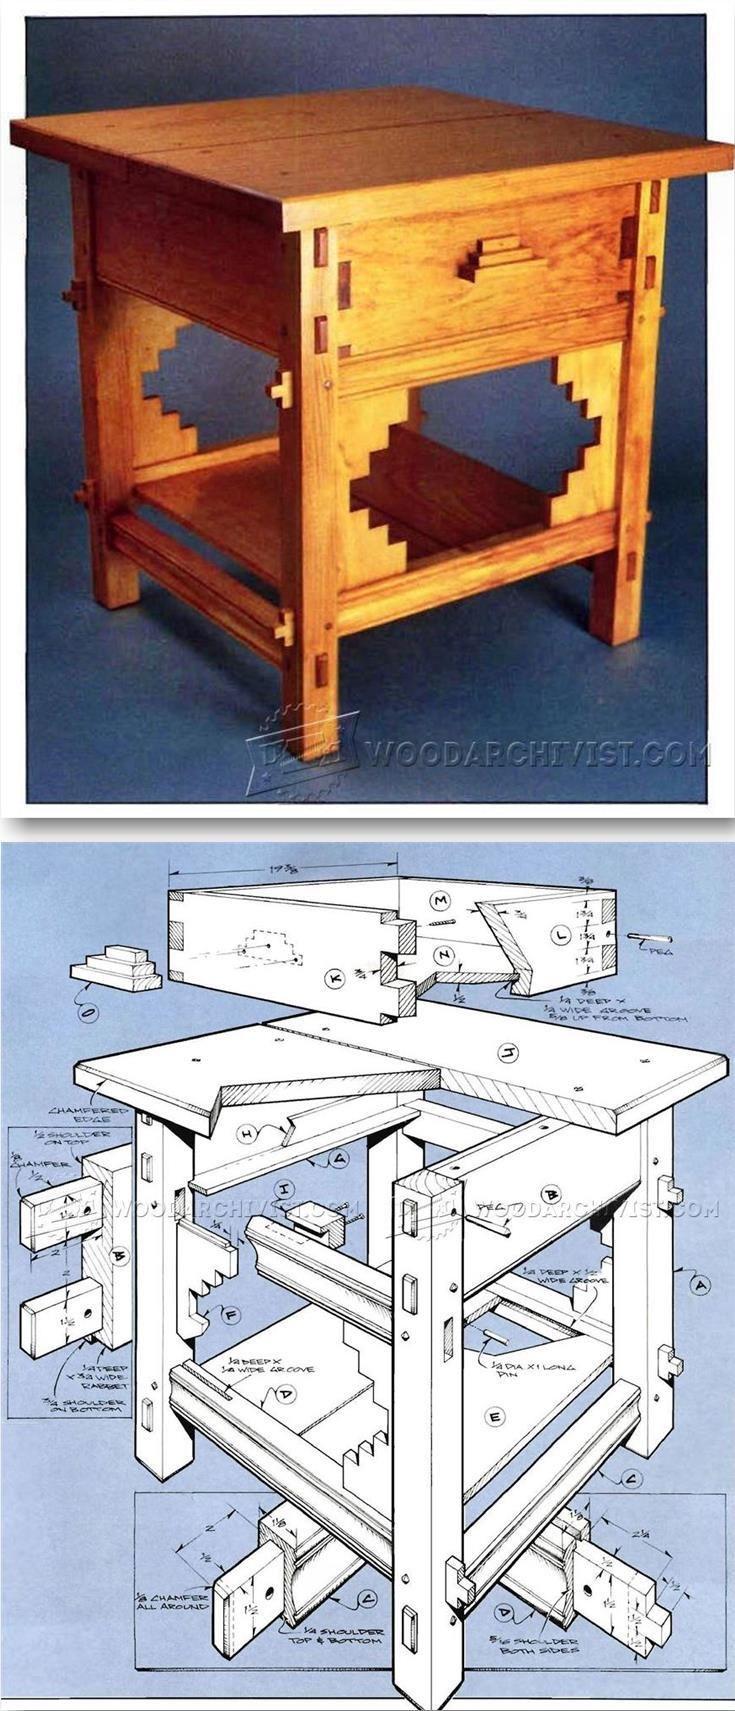 Santa Fe Table Plans - Furniture Plans and Projects   WoodArchivist.com